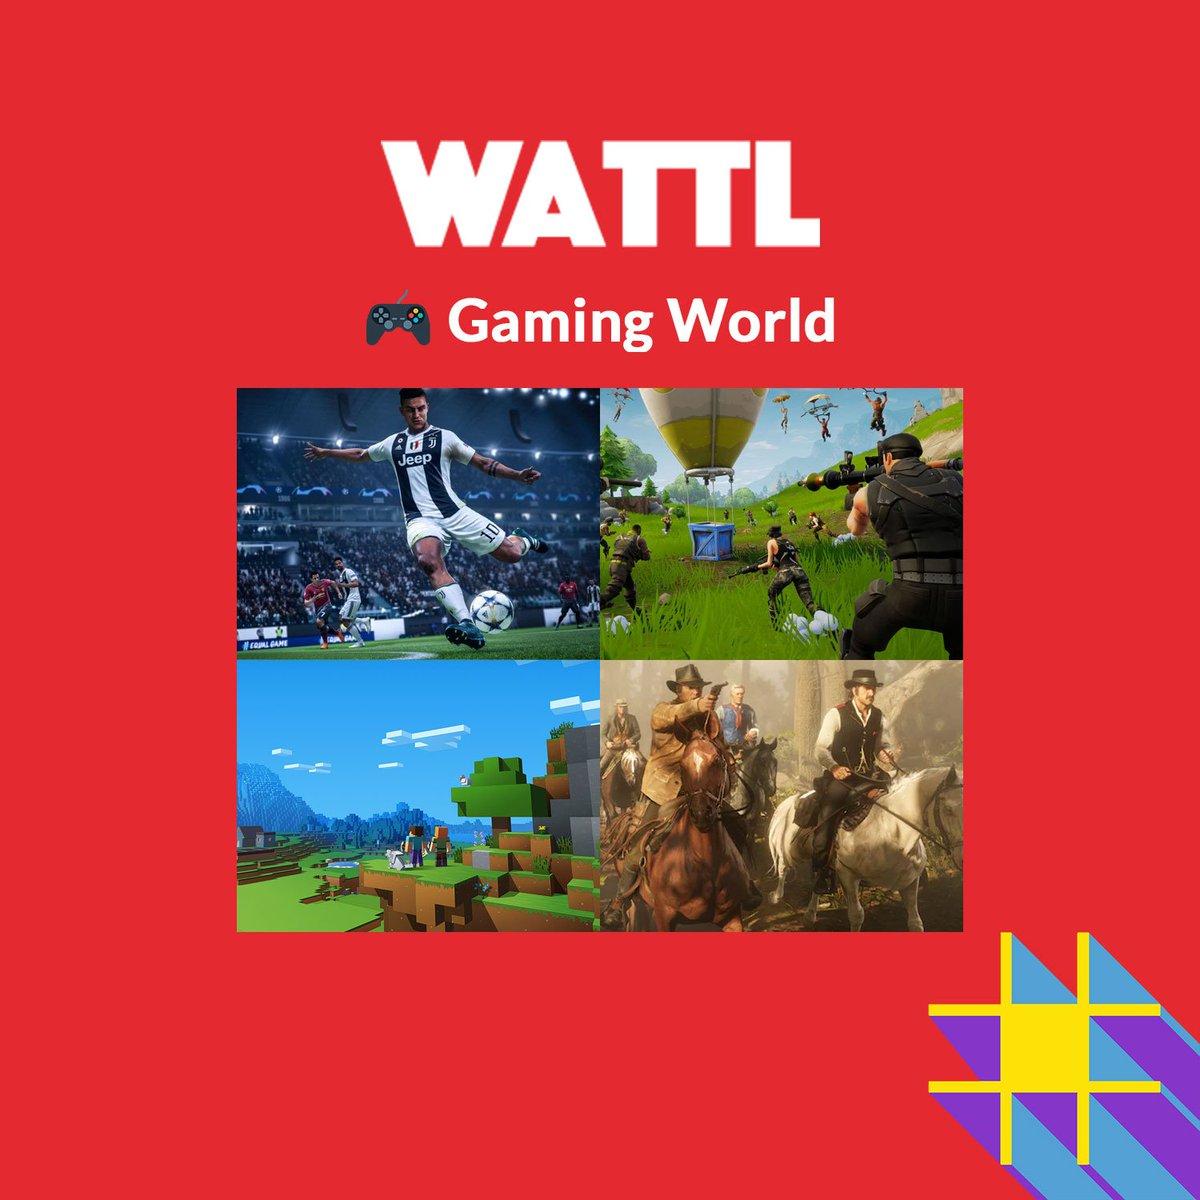 Wattl